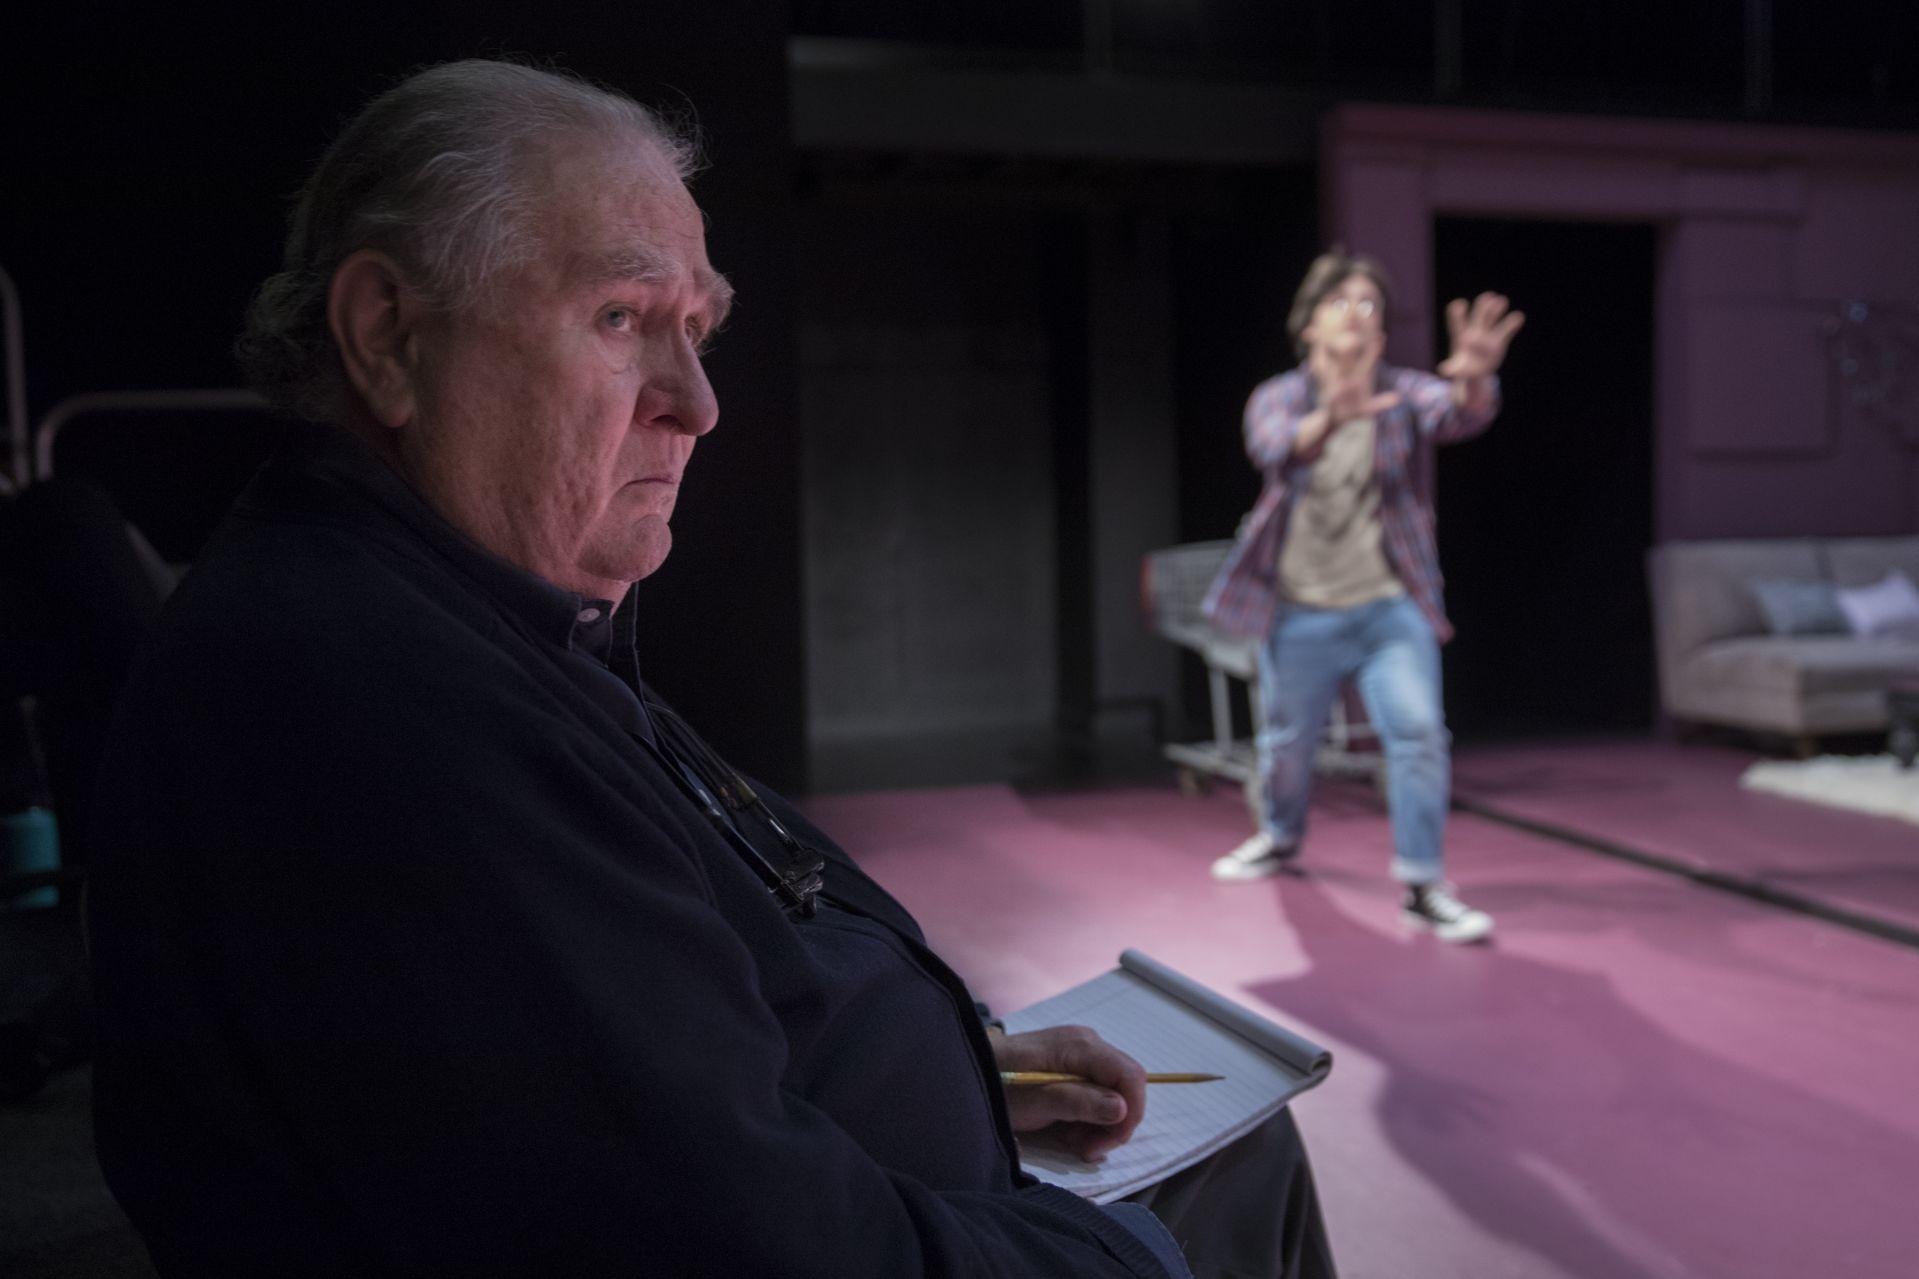 Dana Professor of Theater, Martin Andrucki directs Brady Chilson '23 in Love/Sick. Photo credit Phyllis Graber Jensen